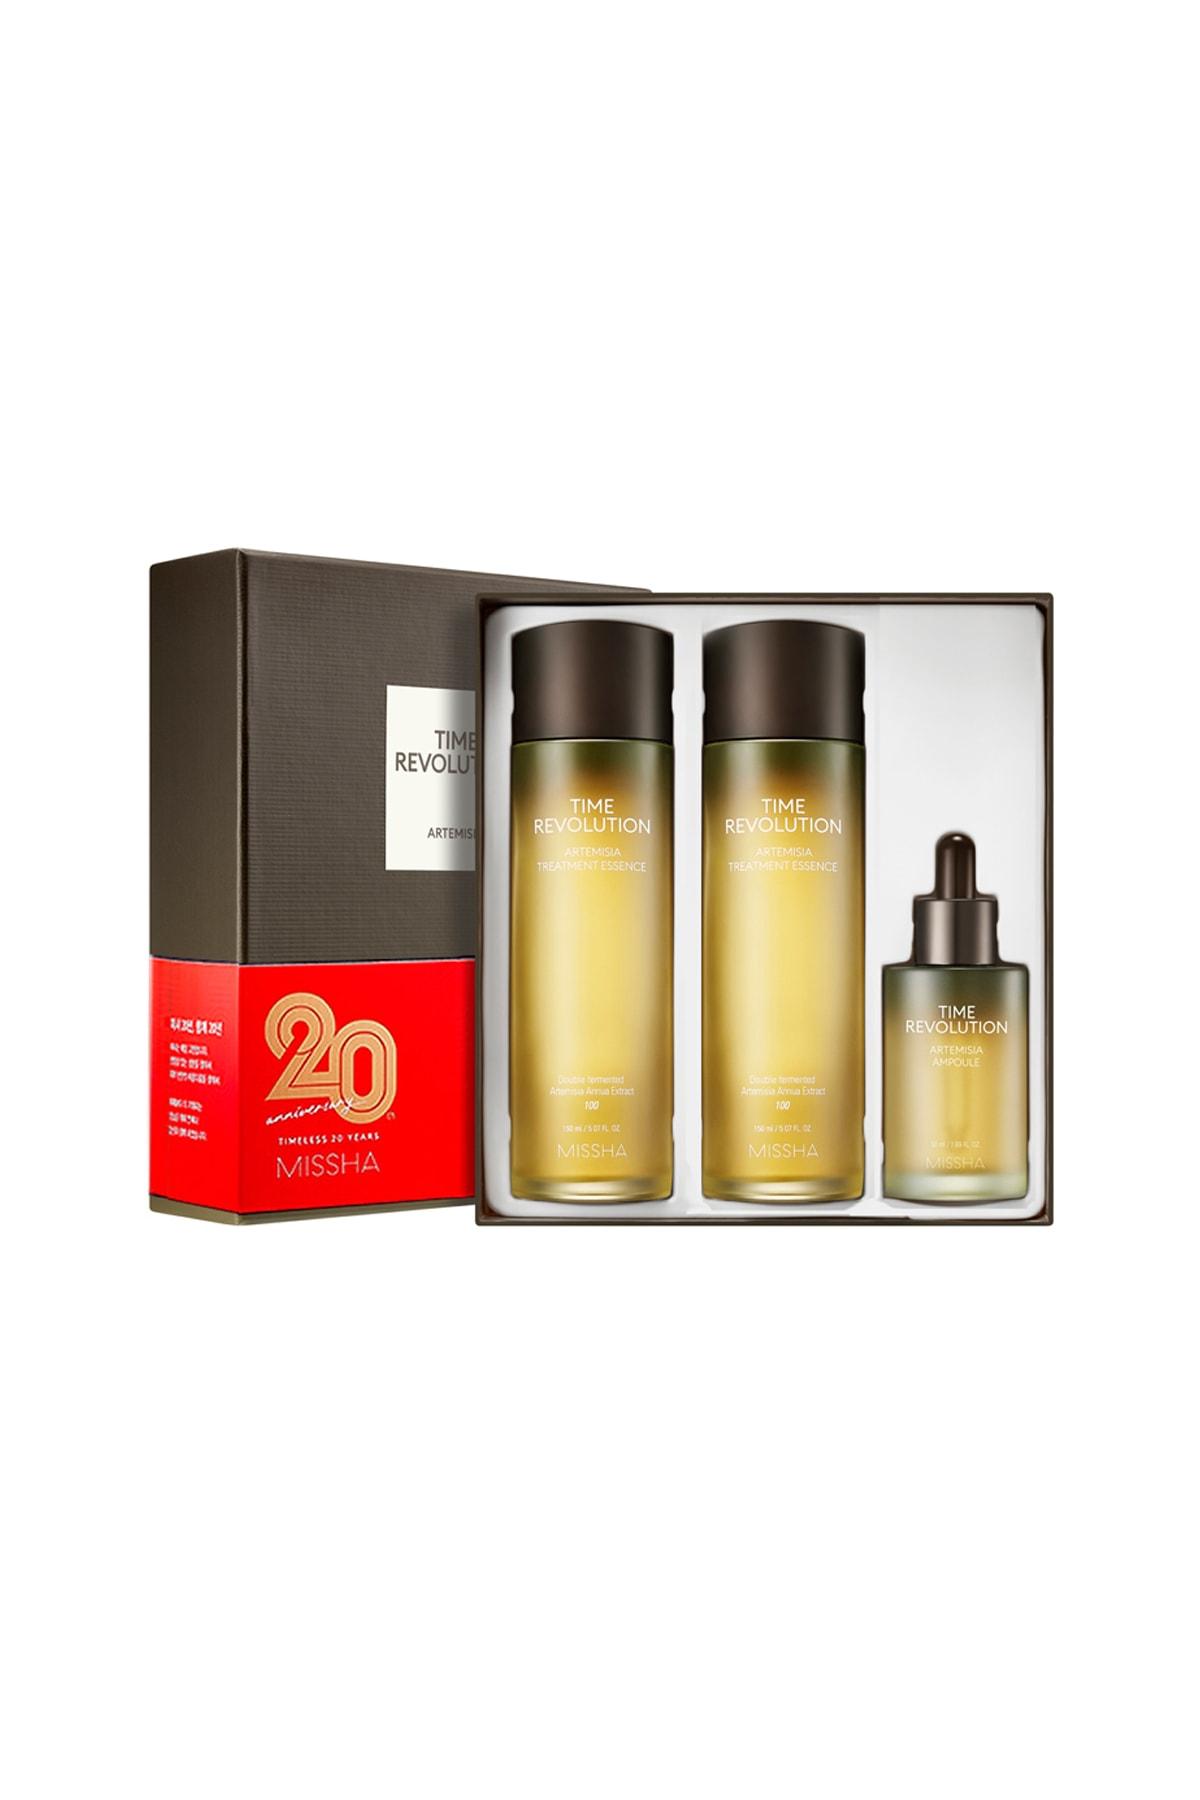 Missha Hassas Ciltler İçin Kızarıklık karşıtı Esans&Serum Seti Time Revolution Artemisia Best Special Set